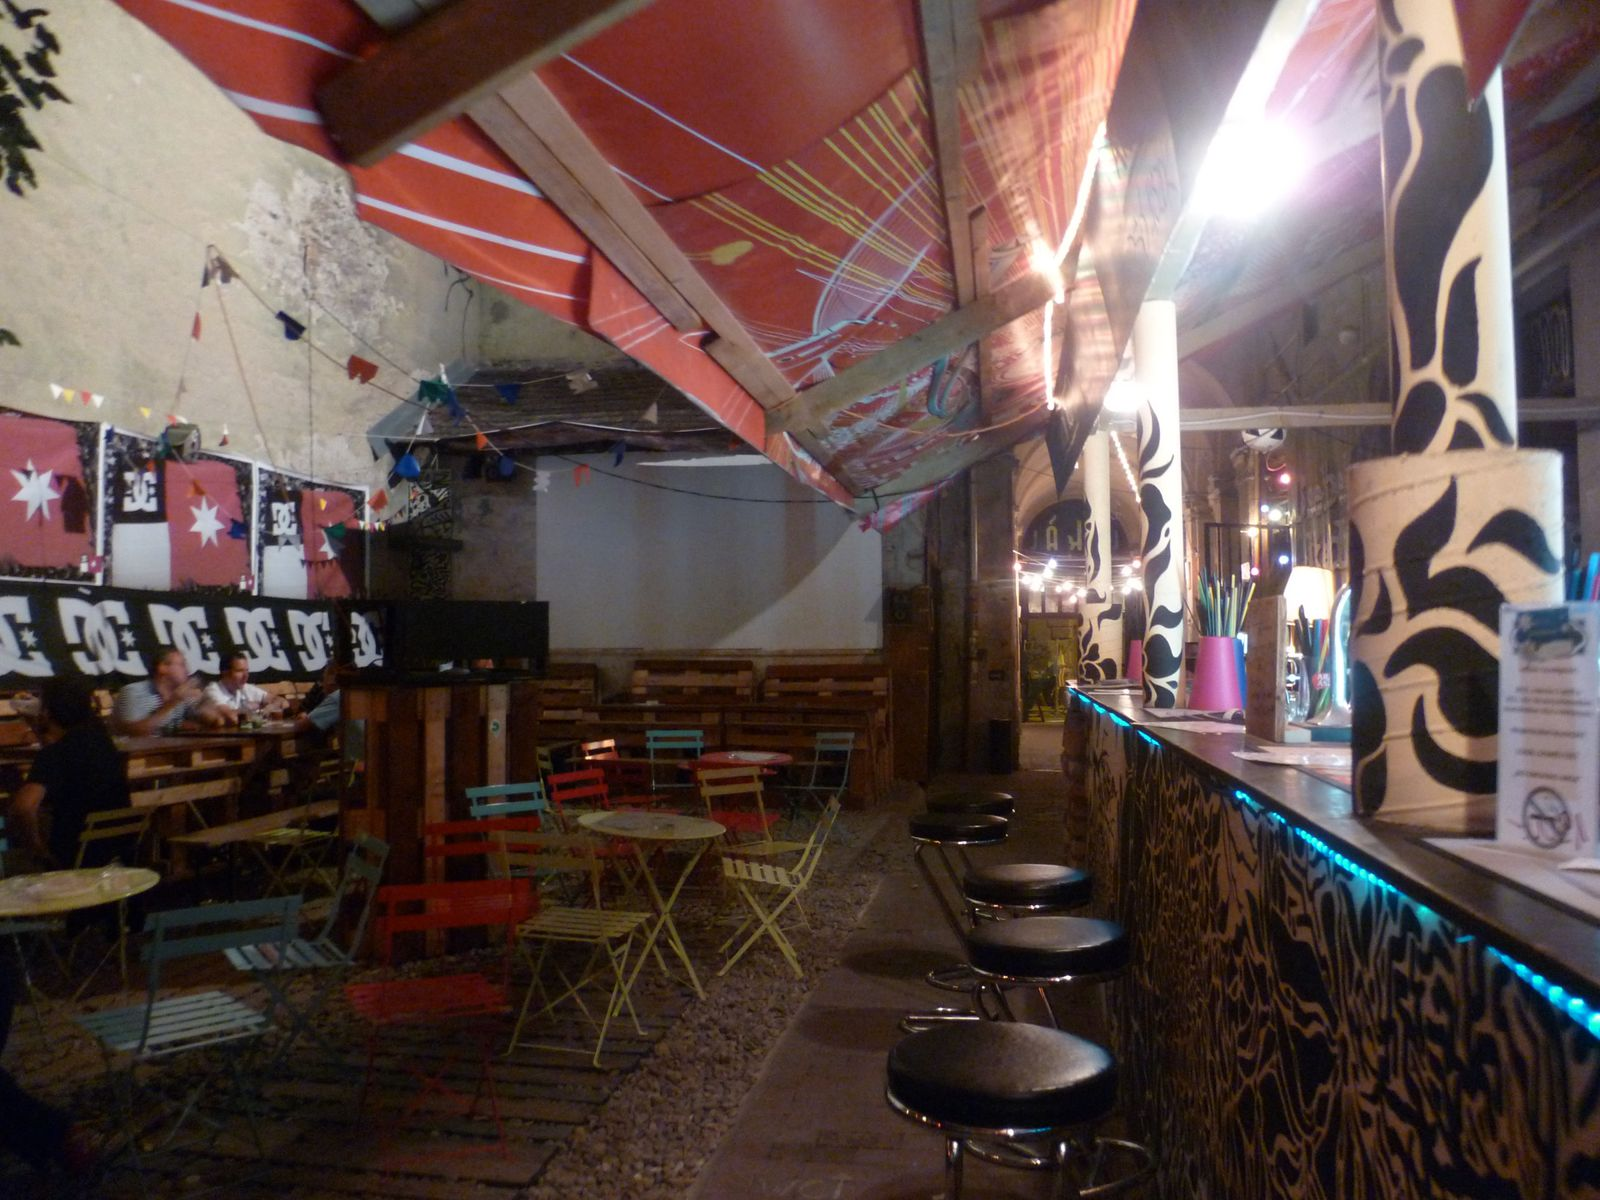 Une soirée budapestoise - août 2012